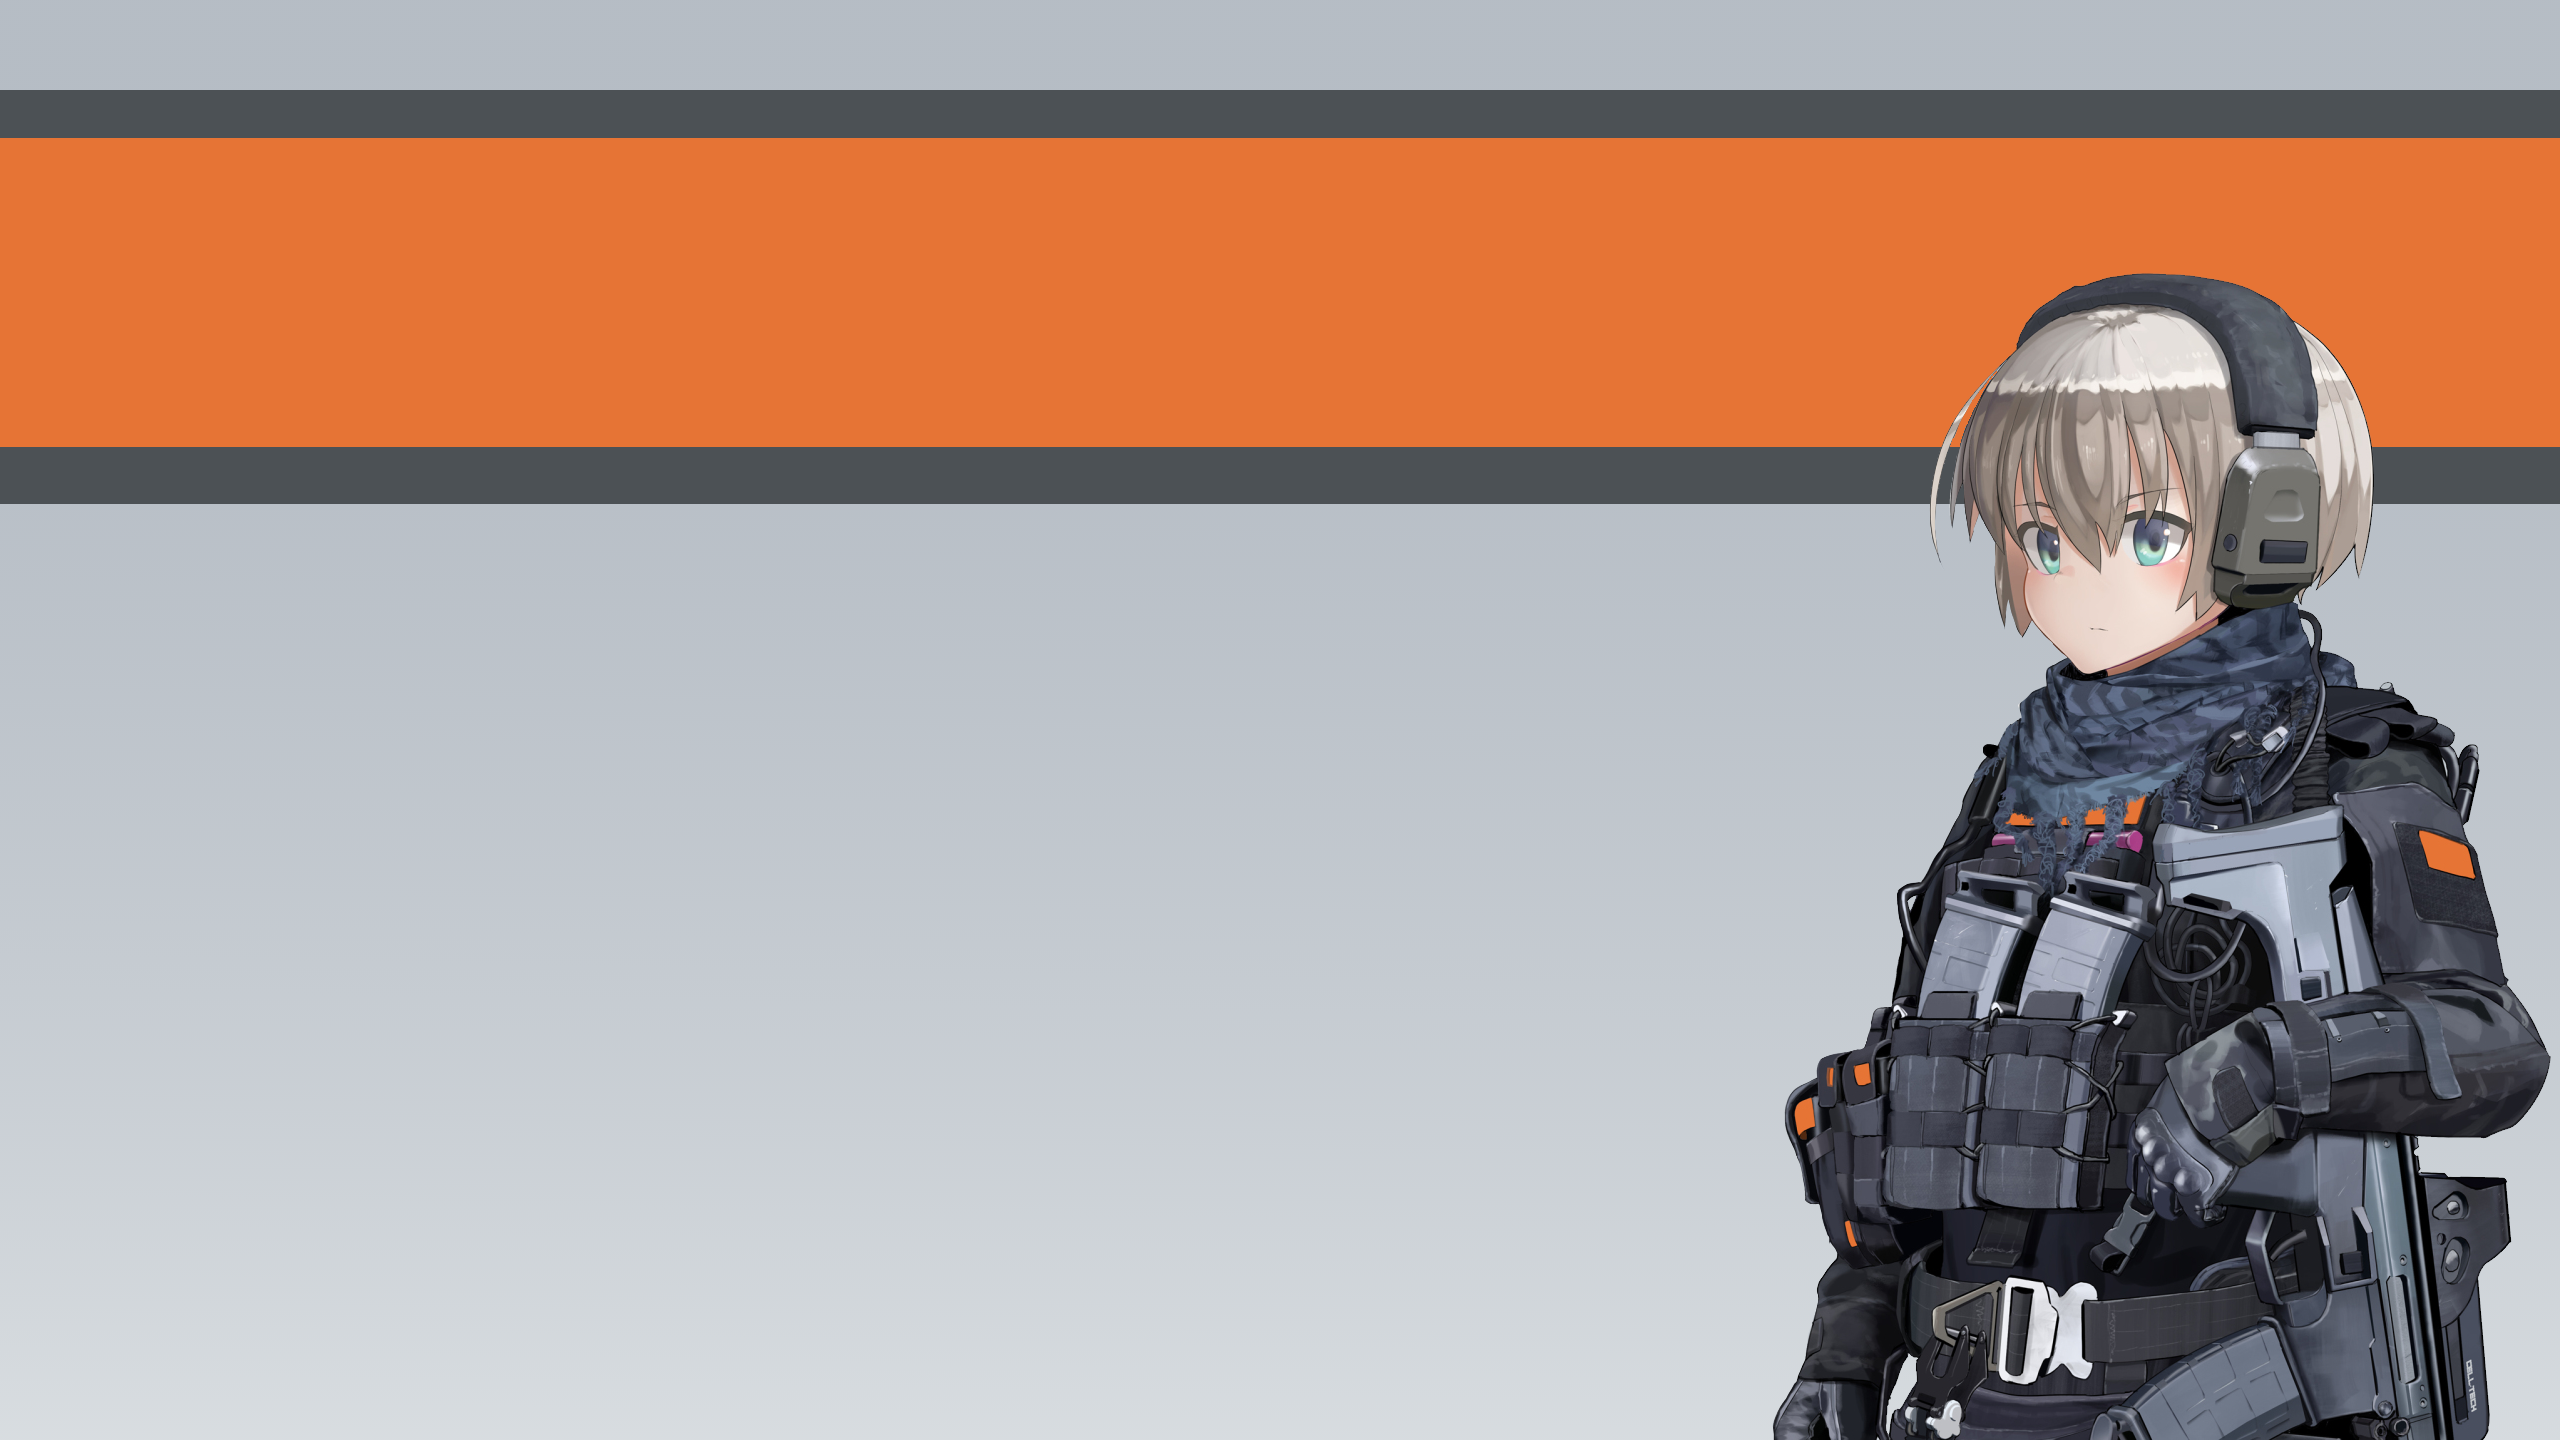 Anime Gun Tactical Camouflage Urban Camo Comtacs Blue Eyes White Hair 2560x1440